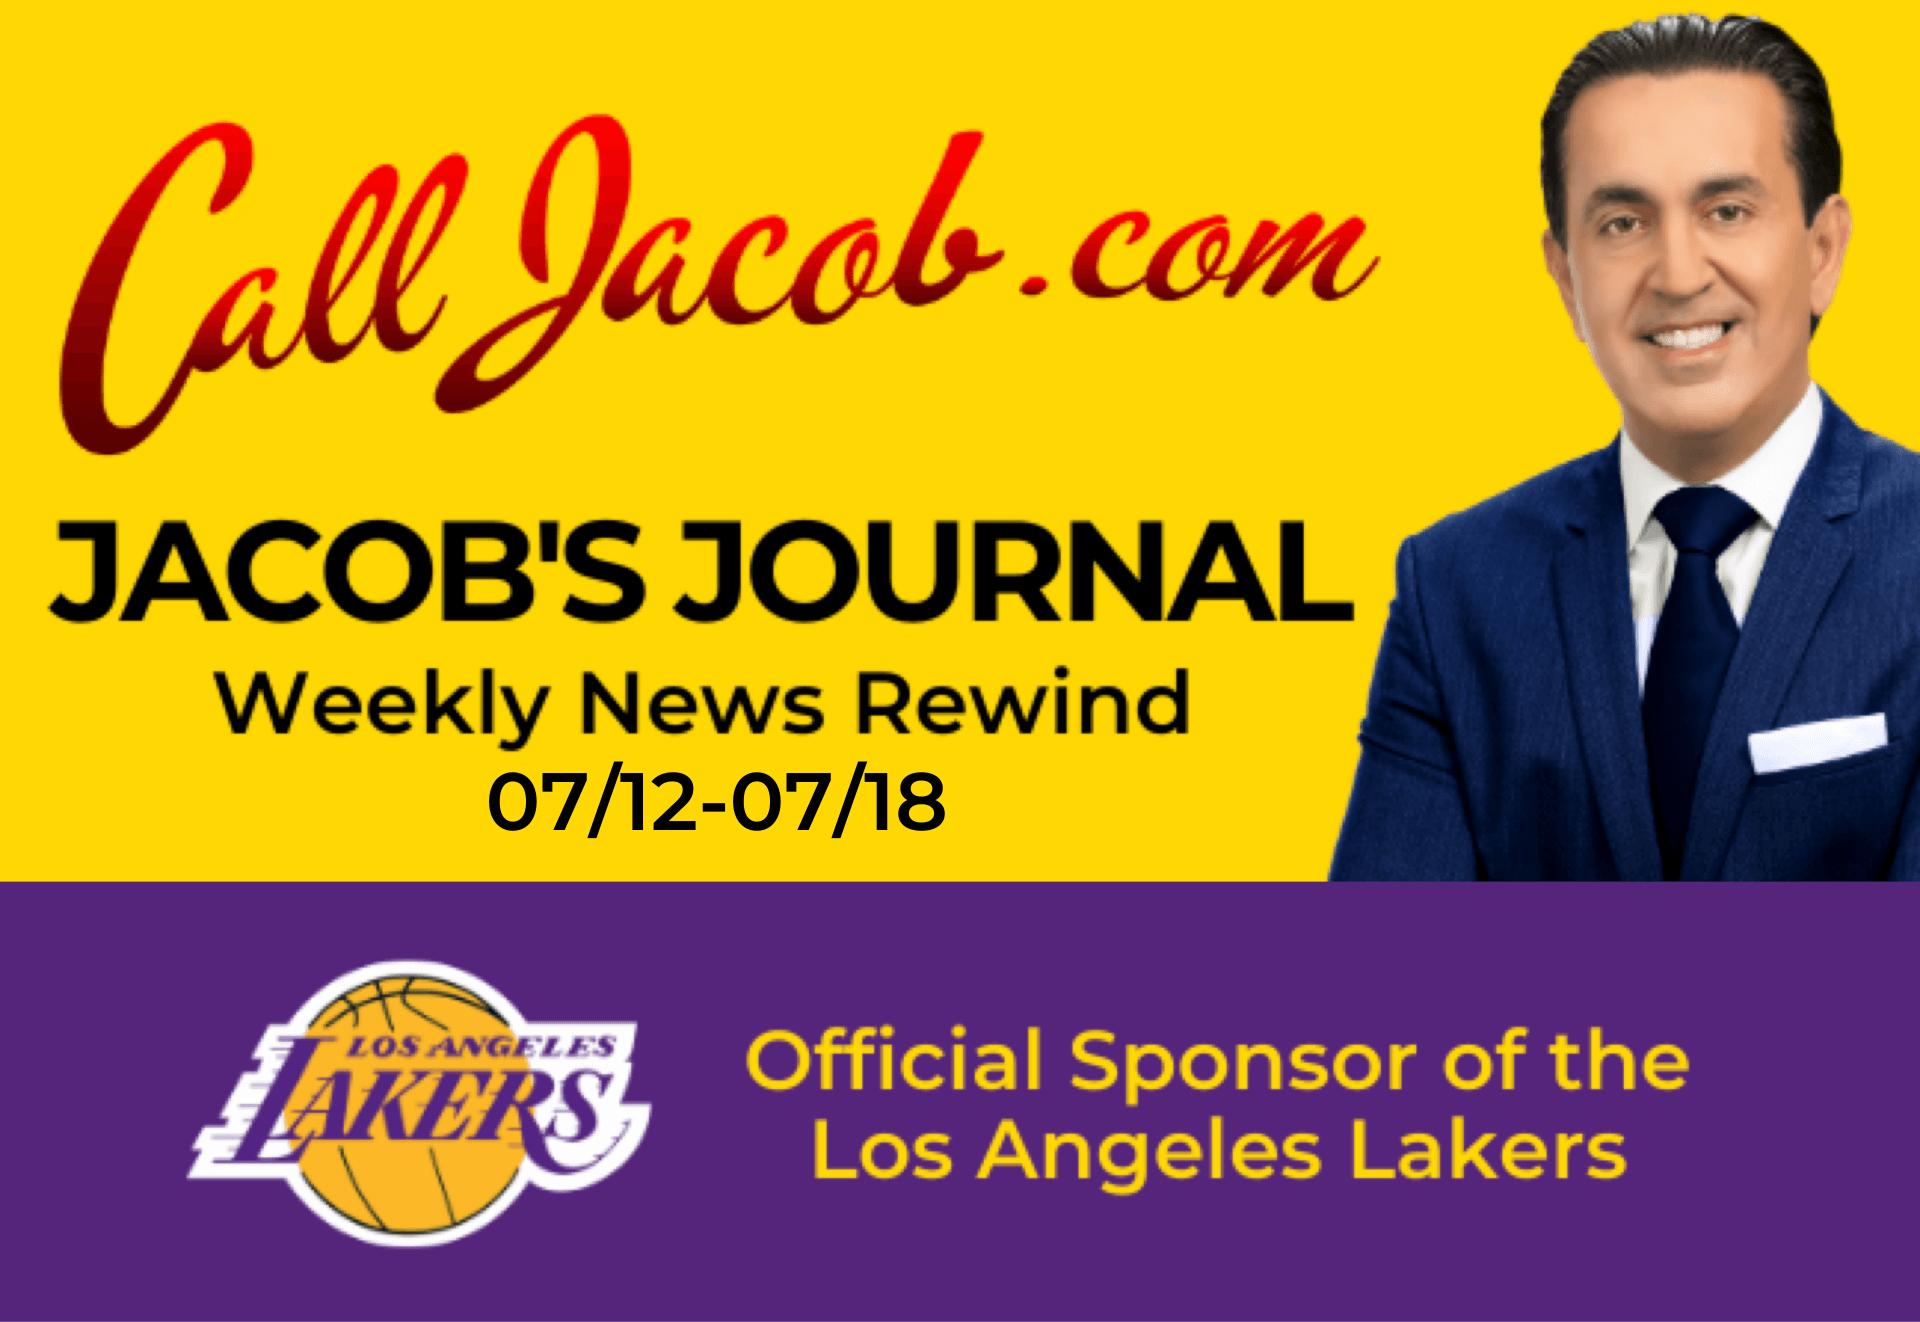 JacobsJournalWeeklyNewsRewind July 11th to July 18th 2021